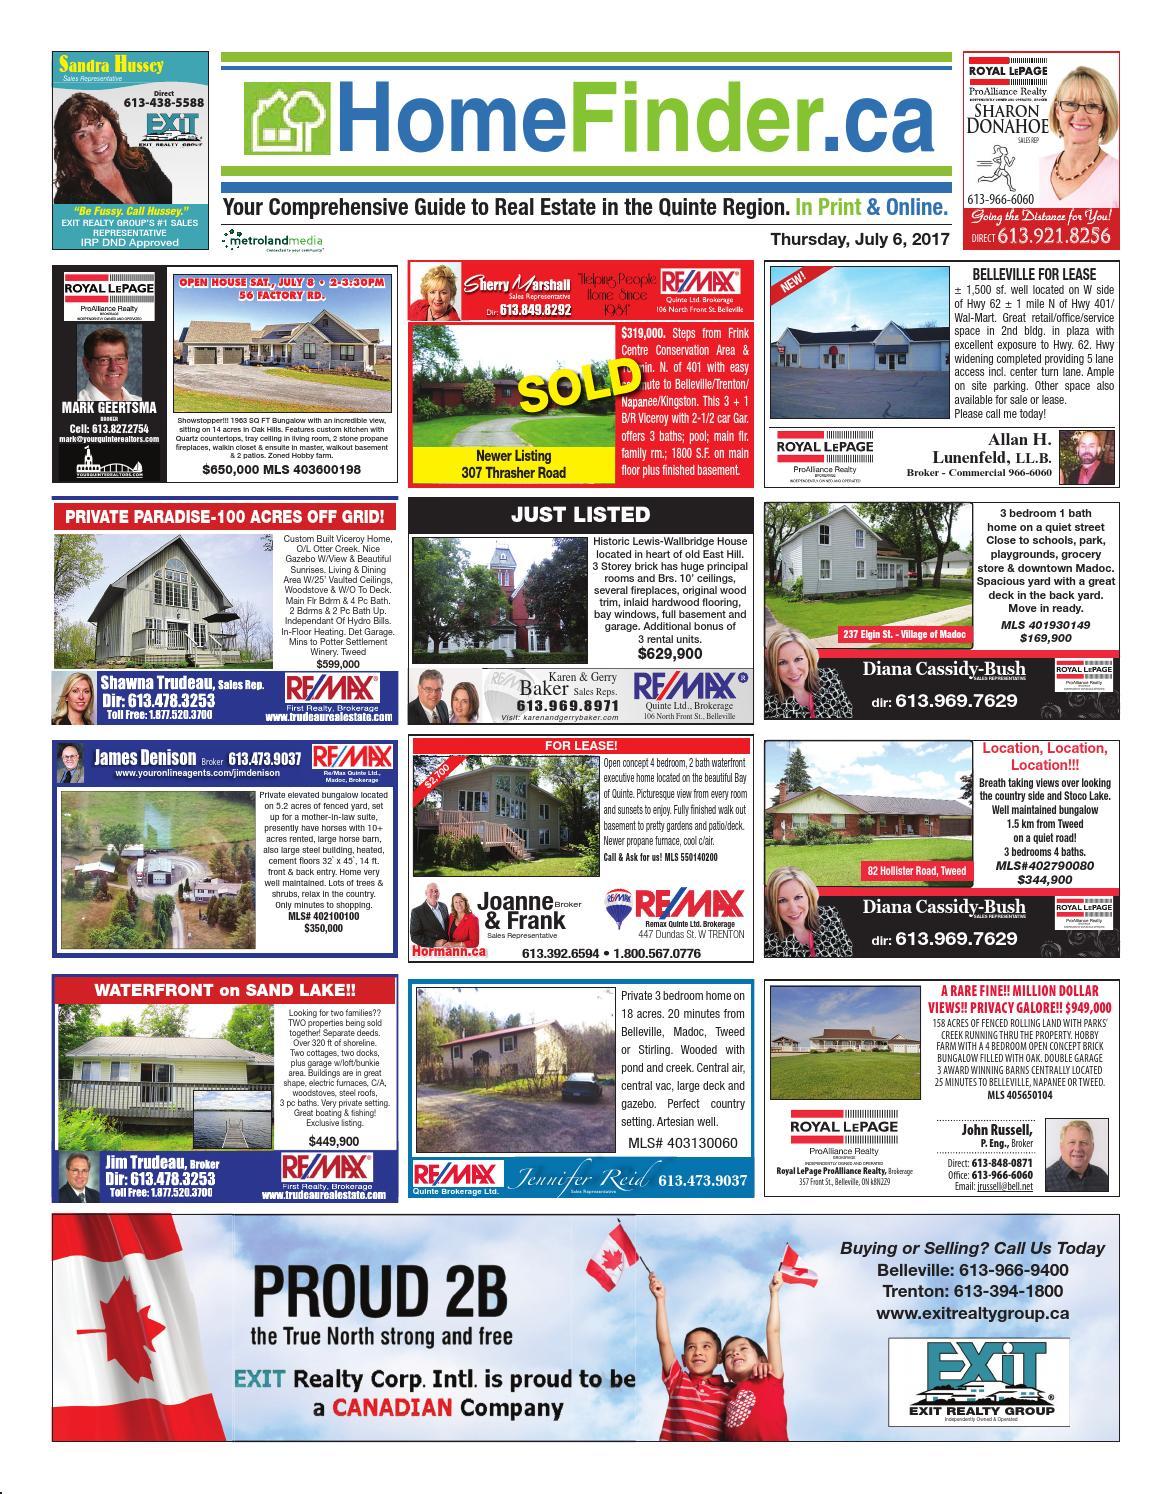 Homefinder070617 by Metroland East - Trent Hills Independent